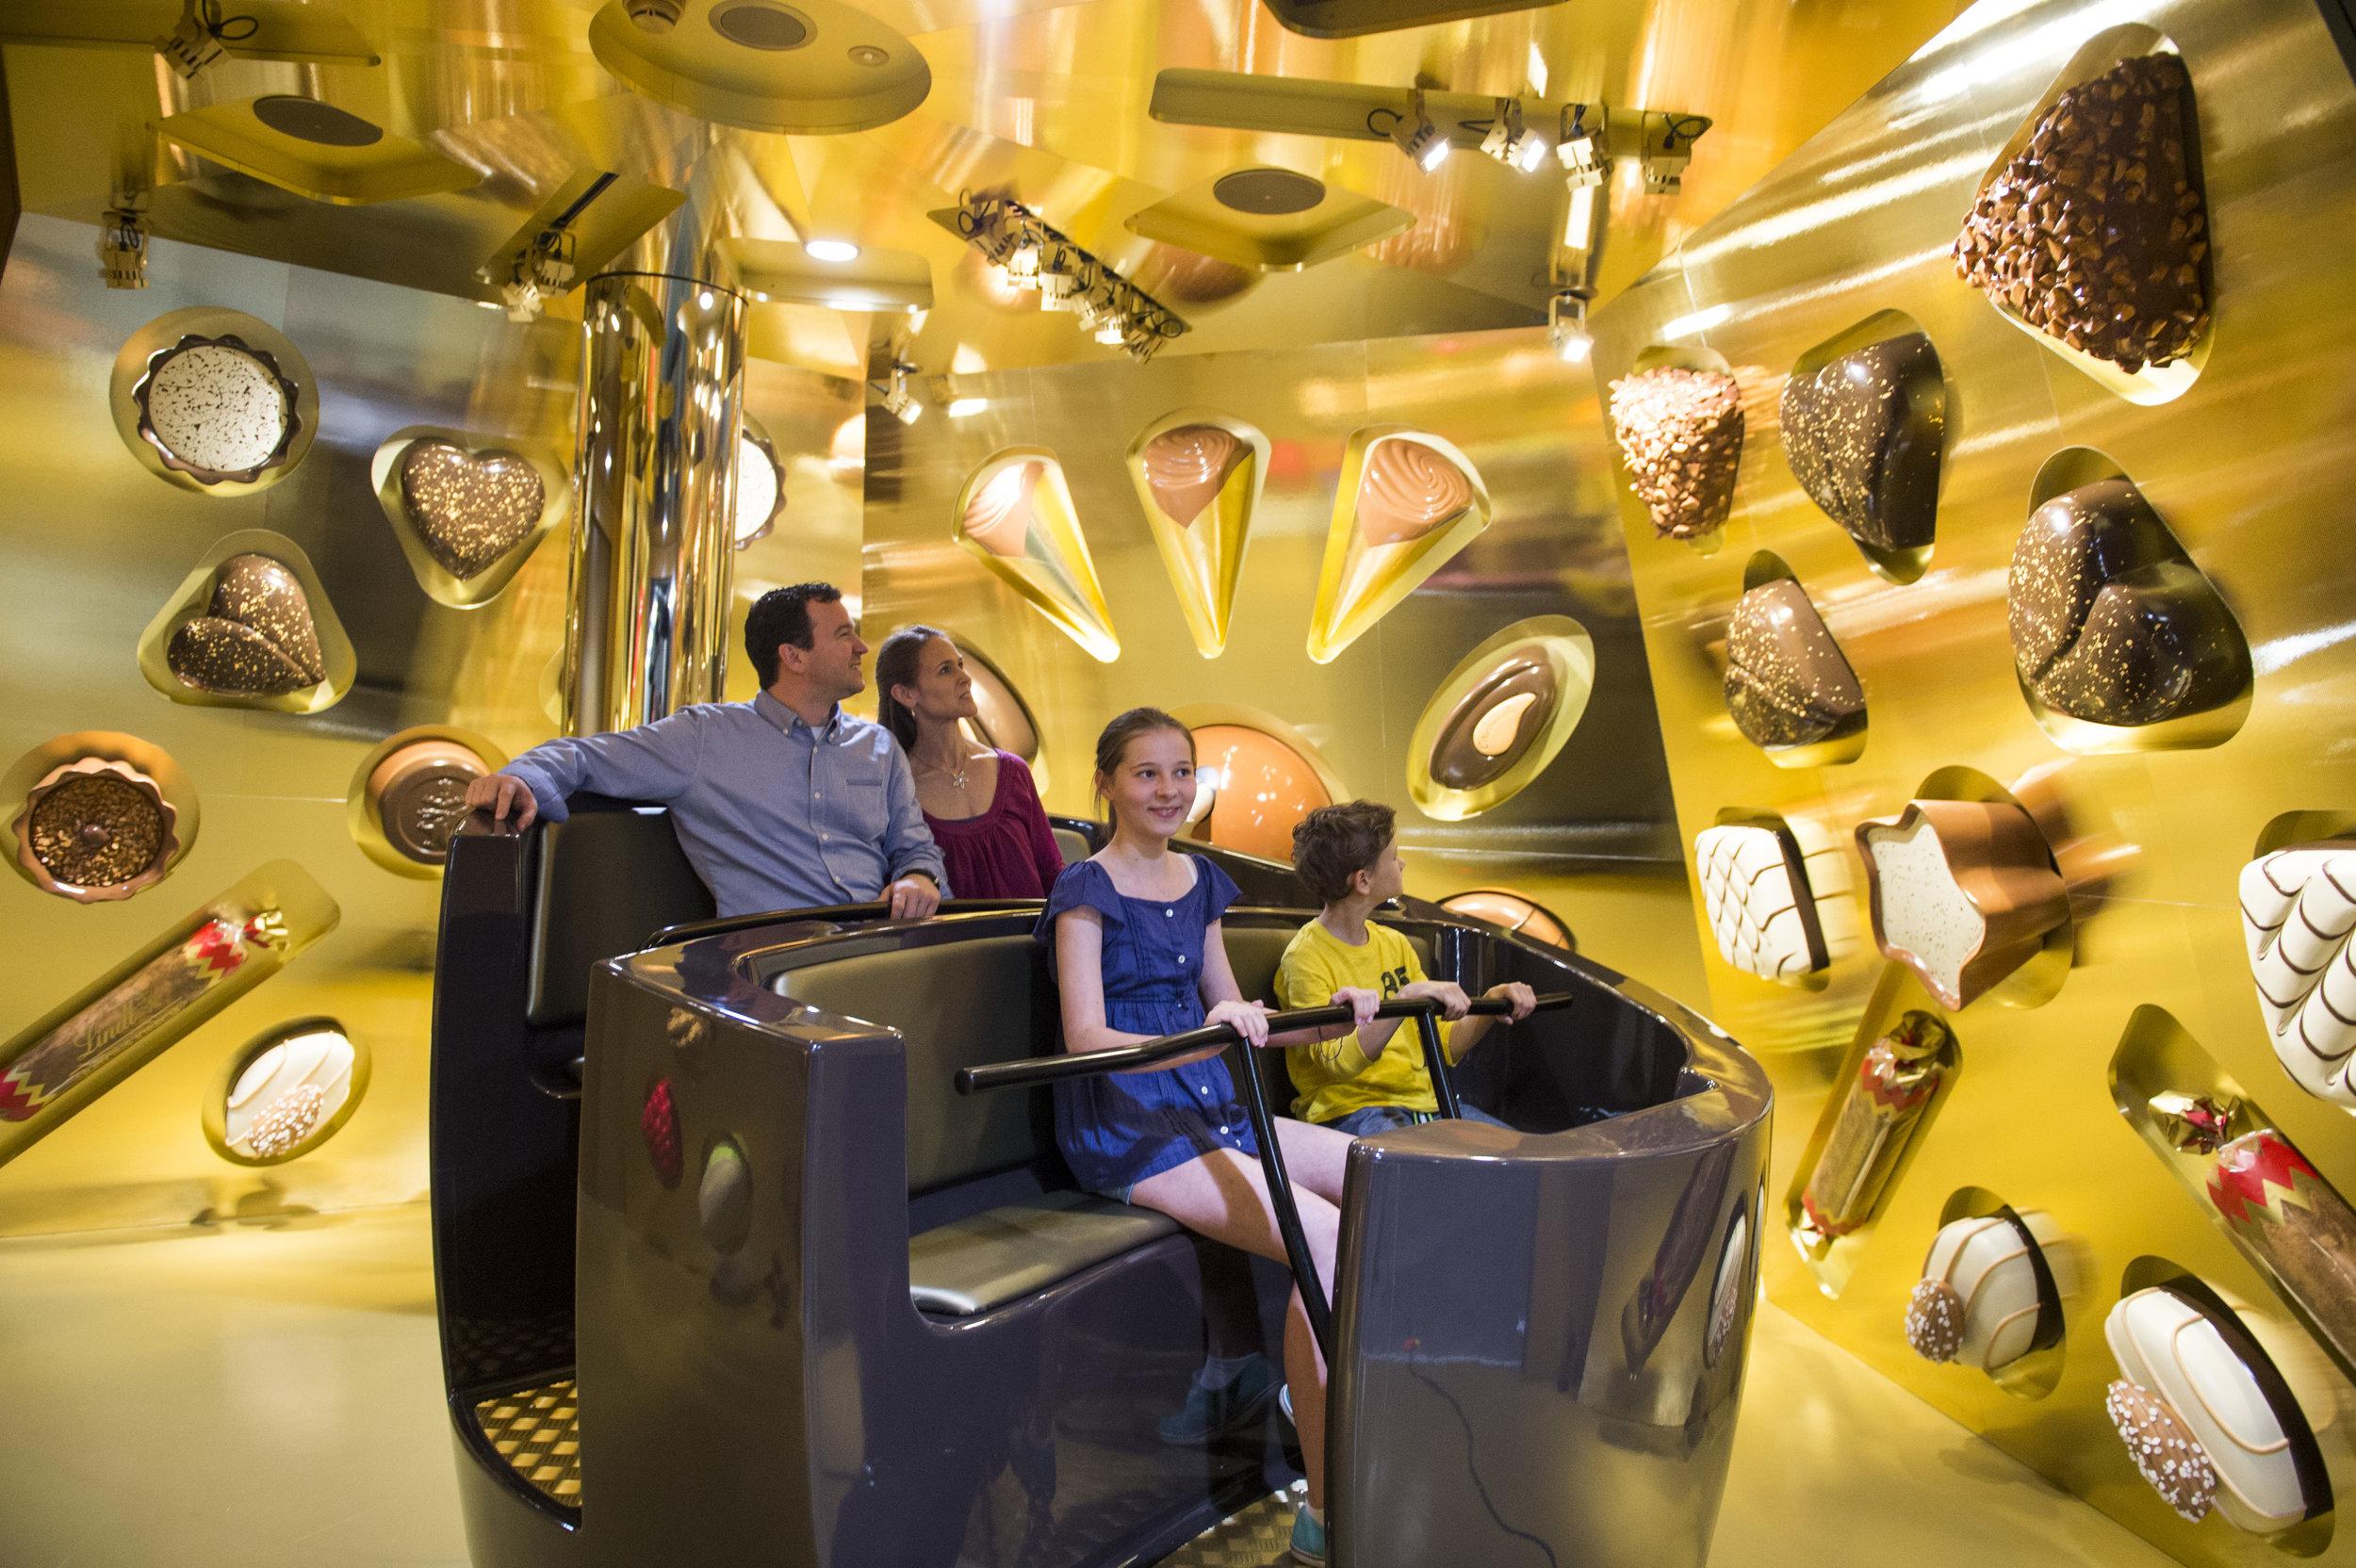 Inside the Lindt Chocolate Adventure. Photo supplied by the Verkehrshaus taken by PHOTOPRESS/Sigi Tischler